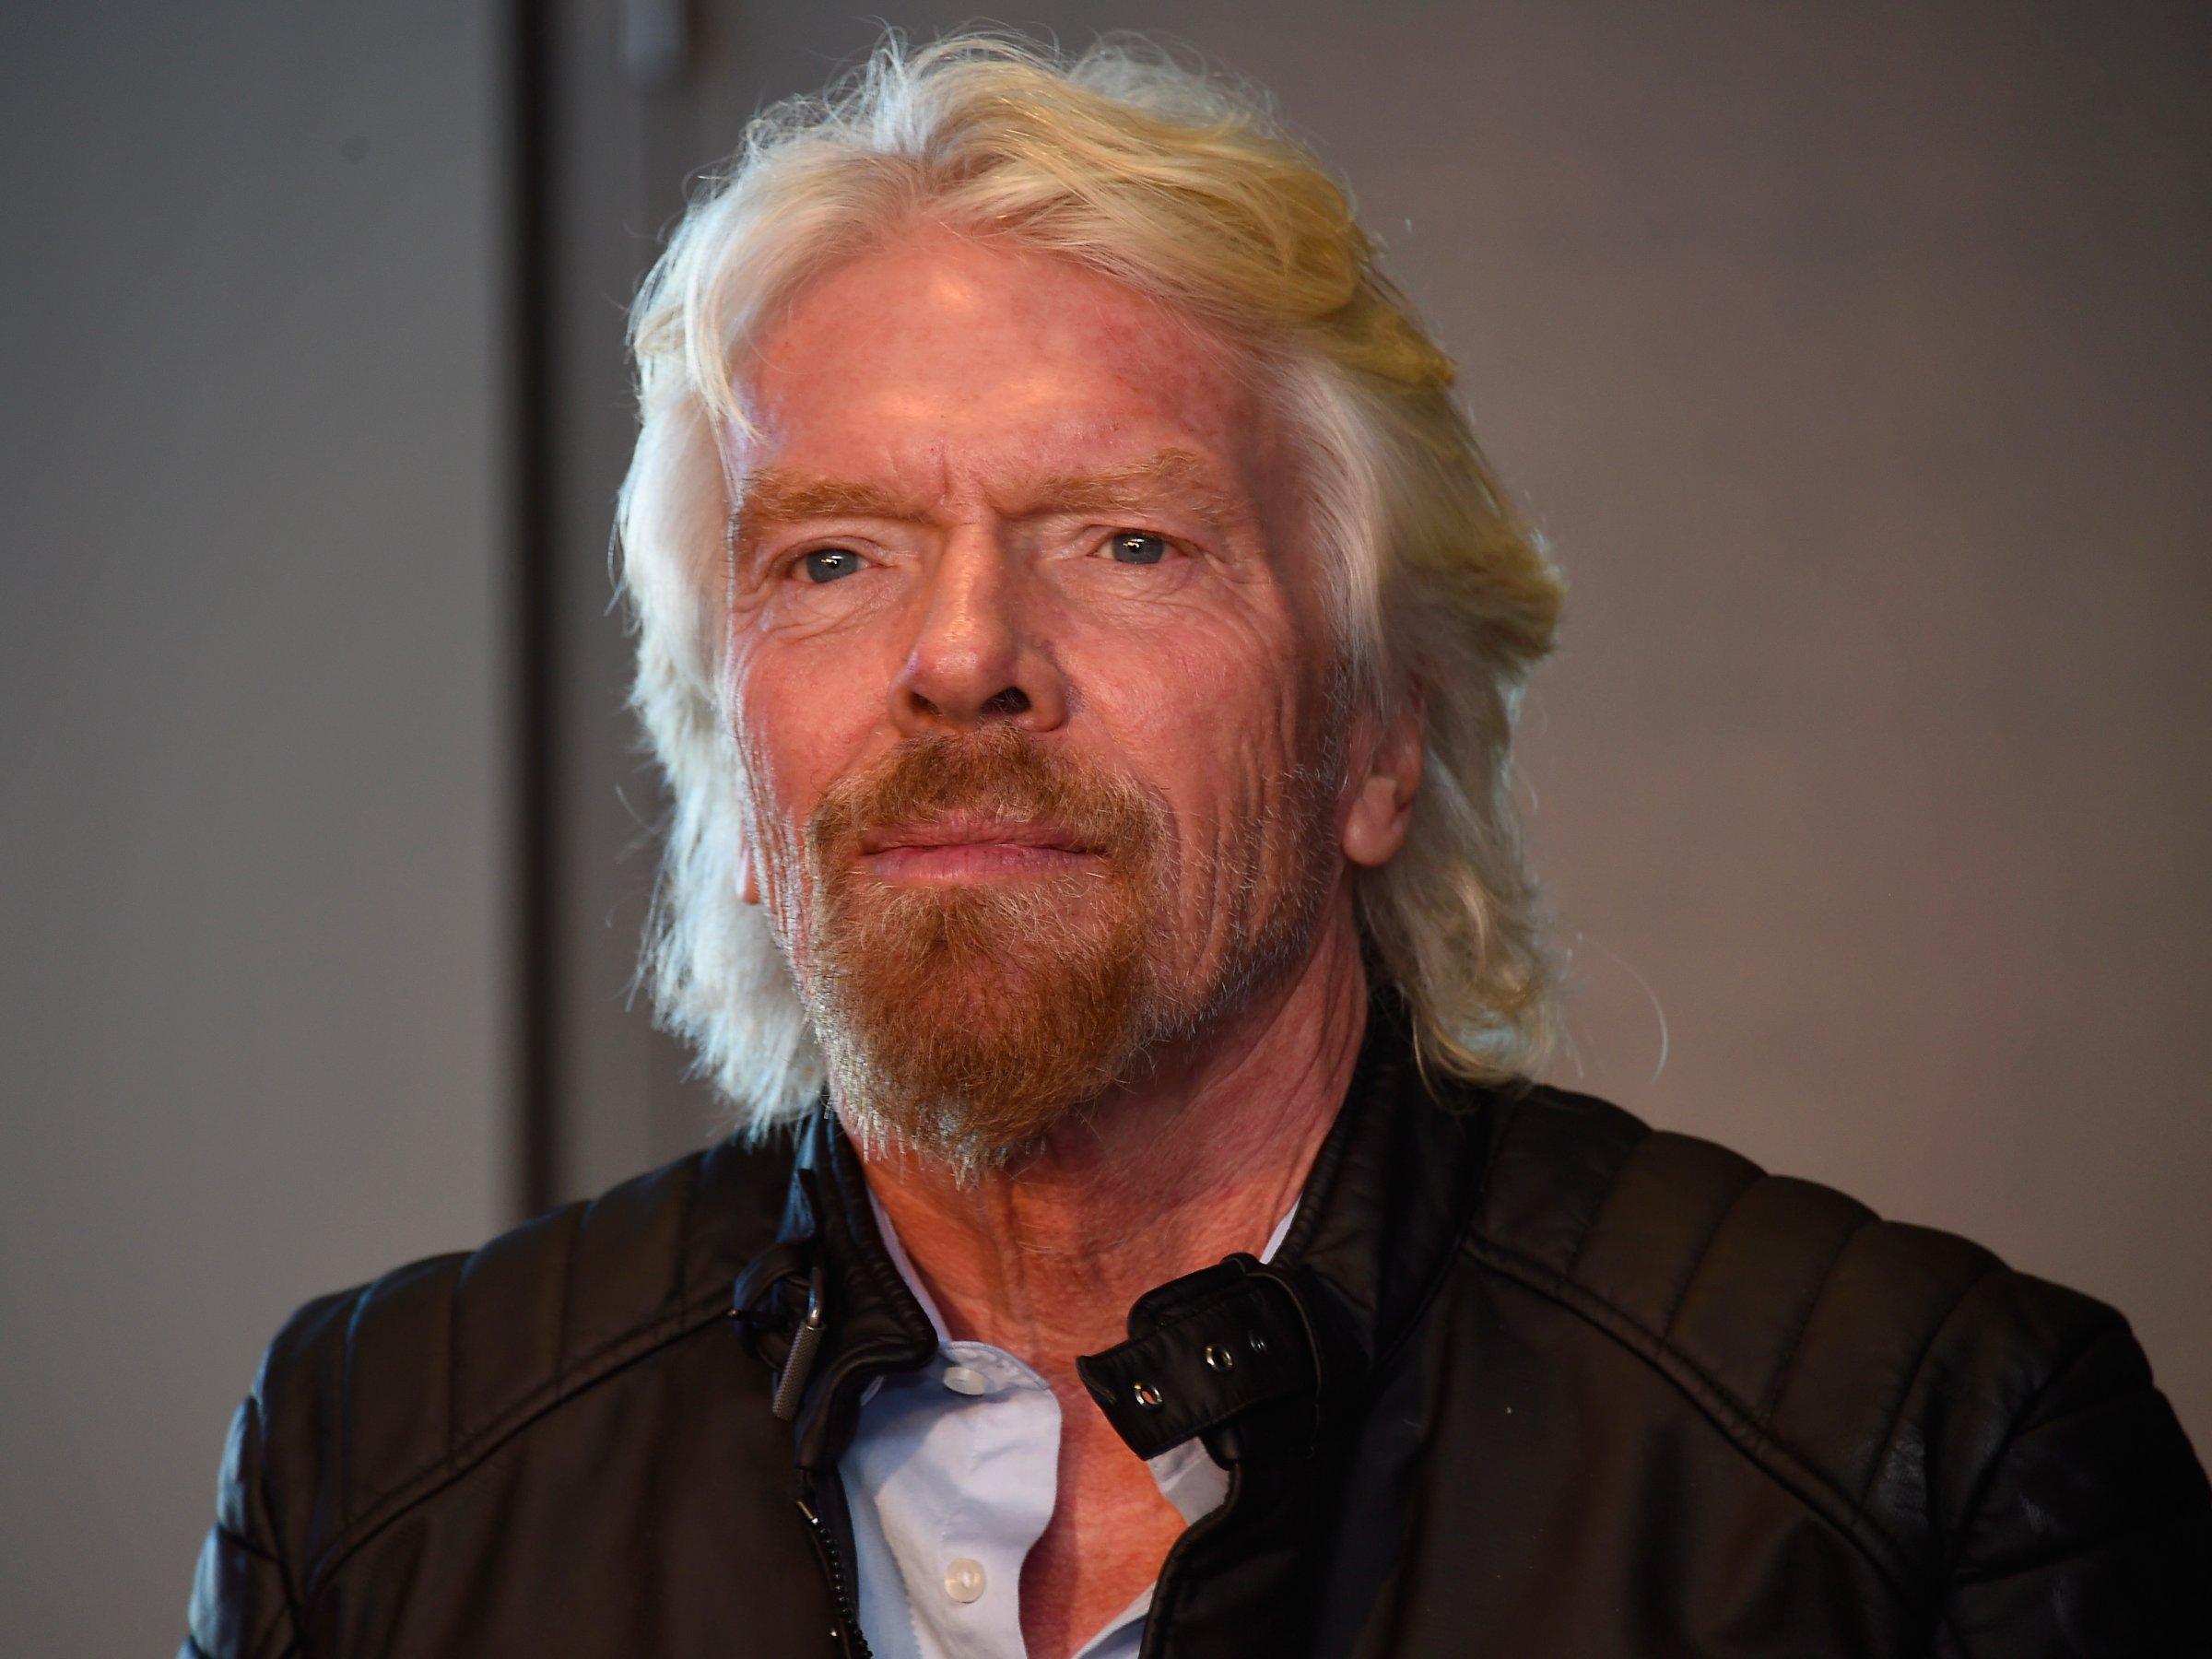 Richard Branson Images